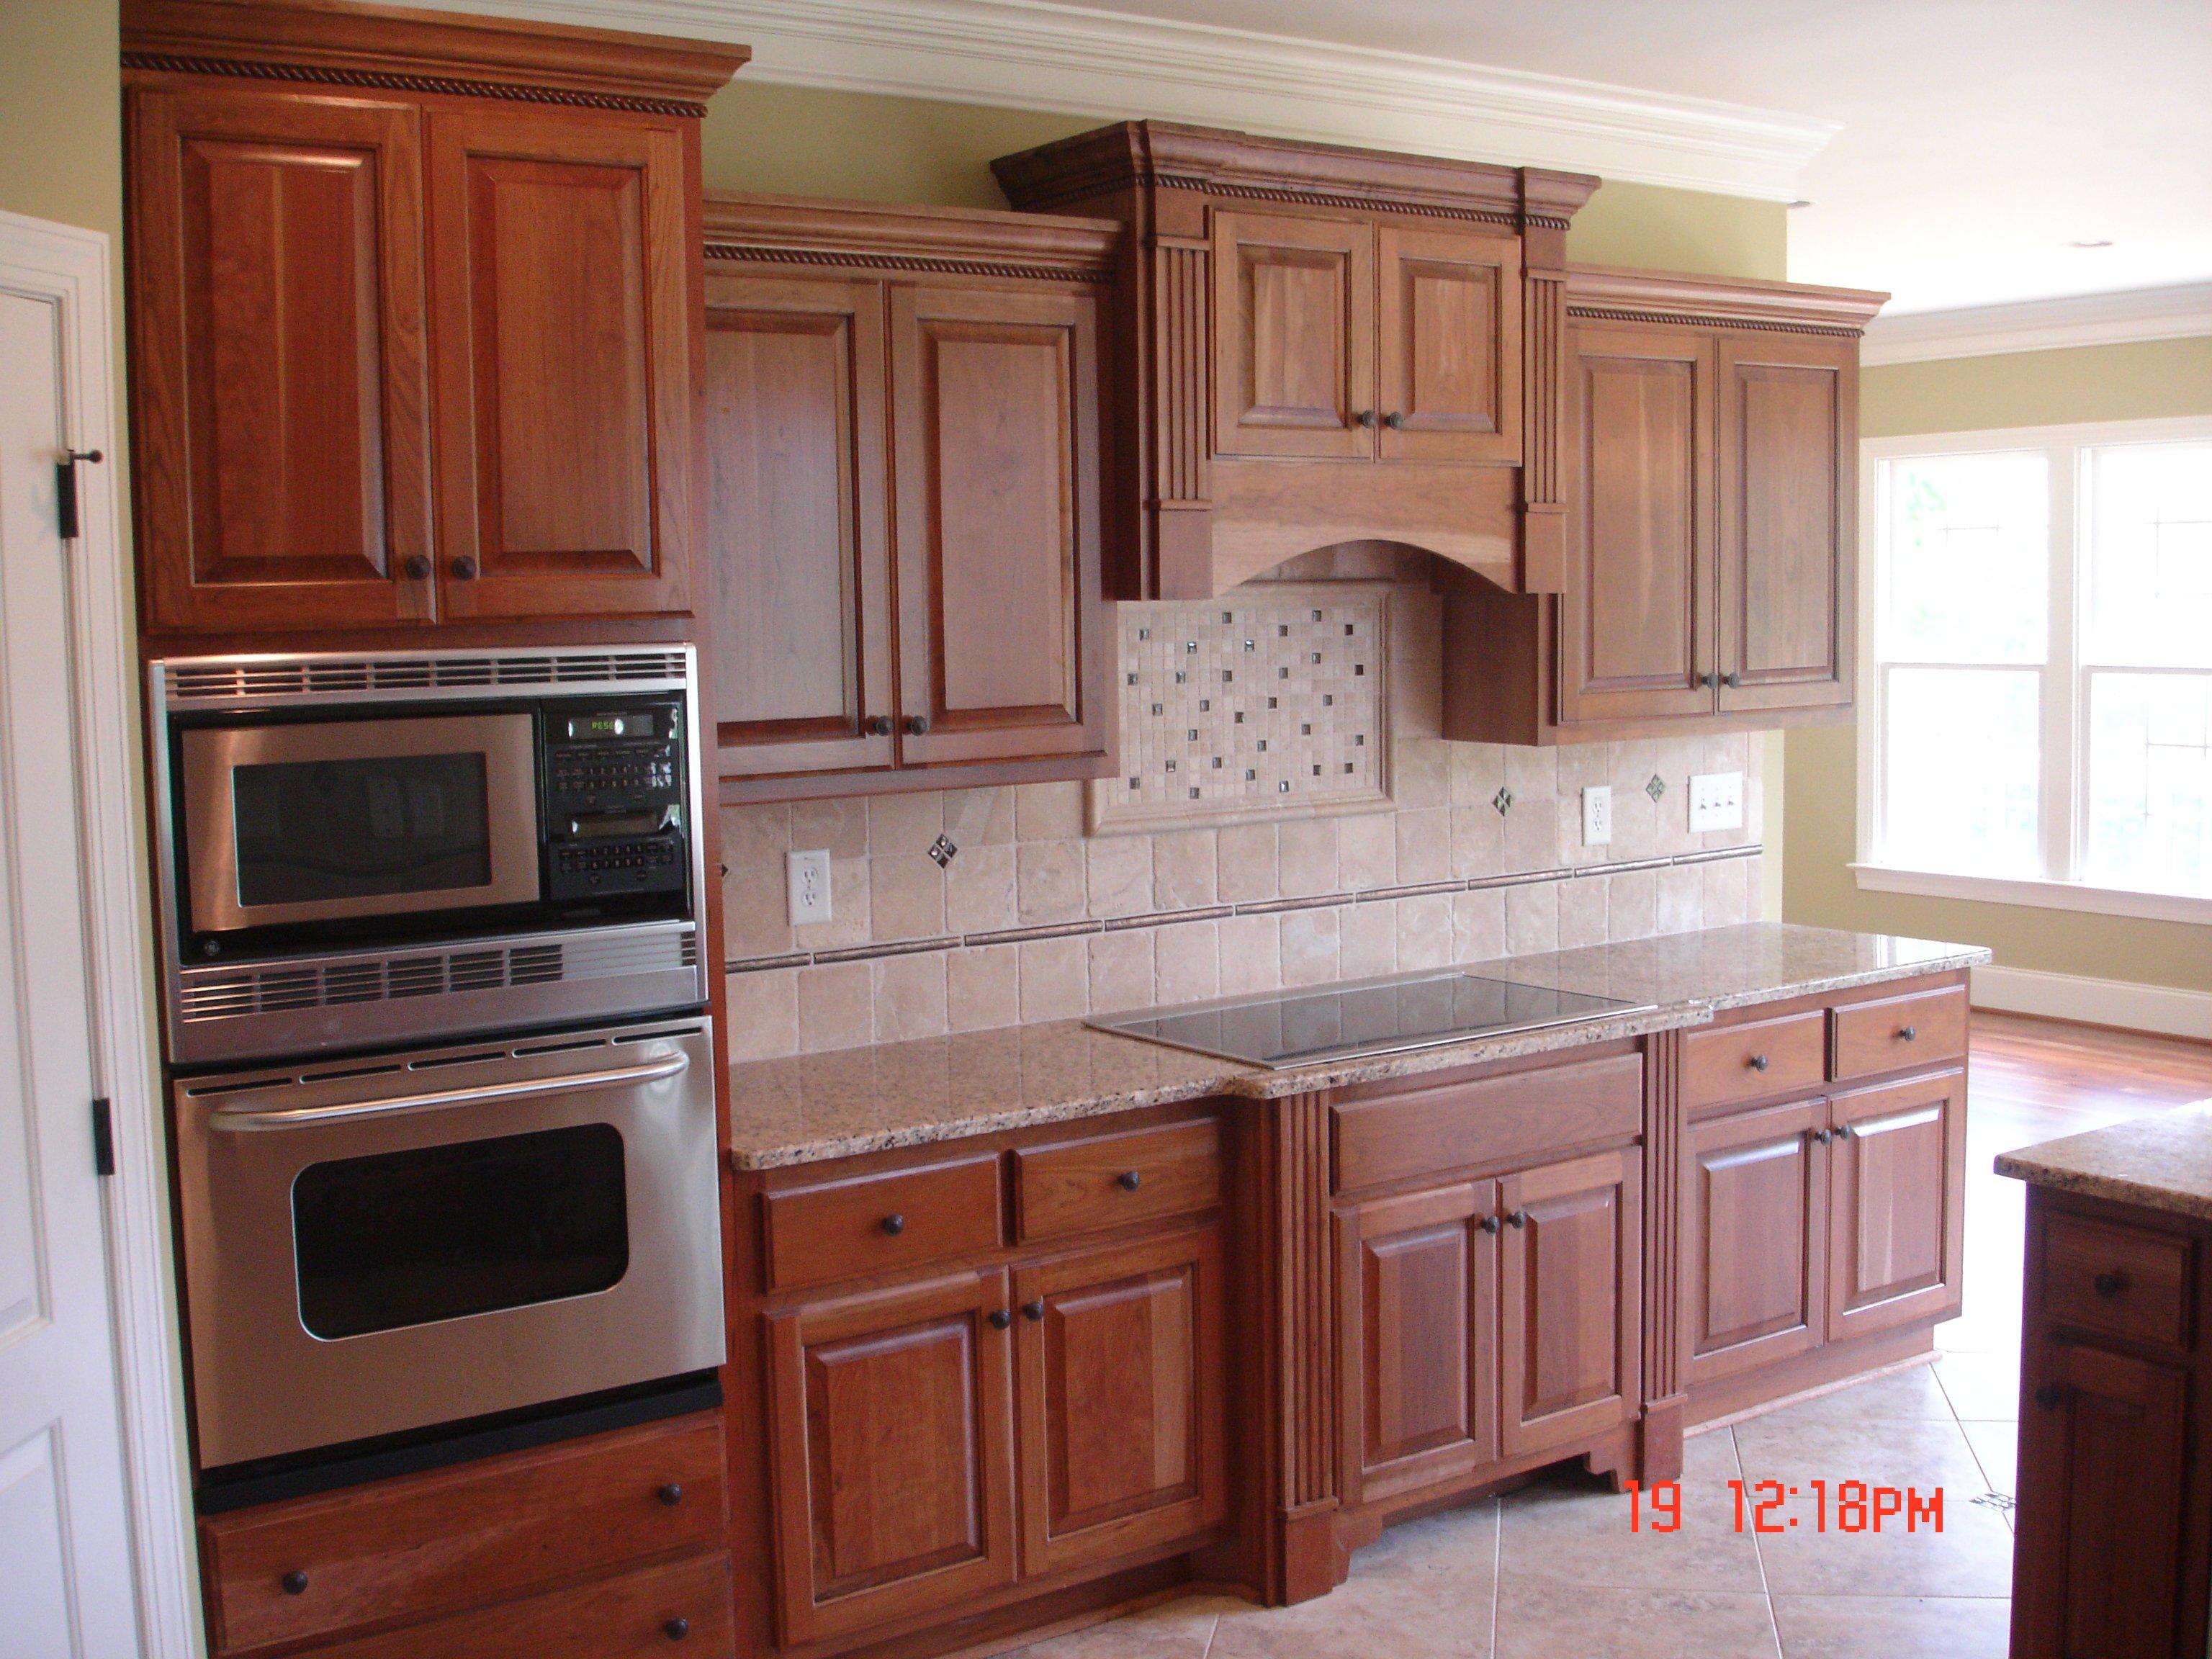 J Kitchen Cabinets Fayetteville Nc  Cabinets Matttroy